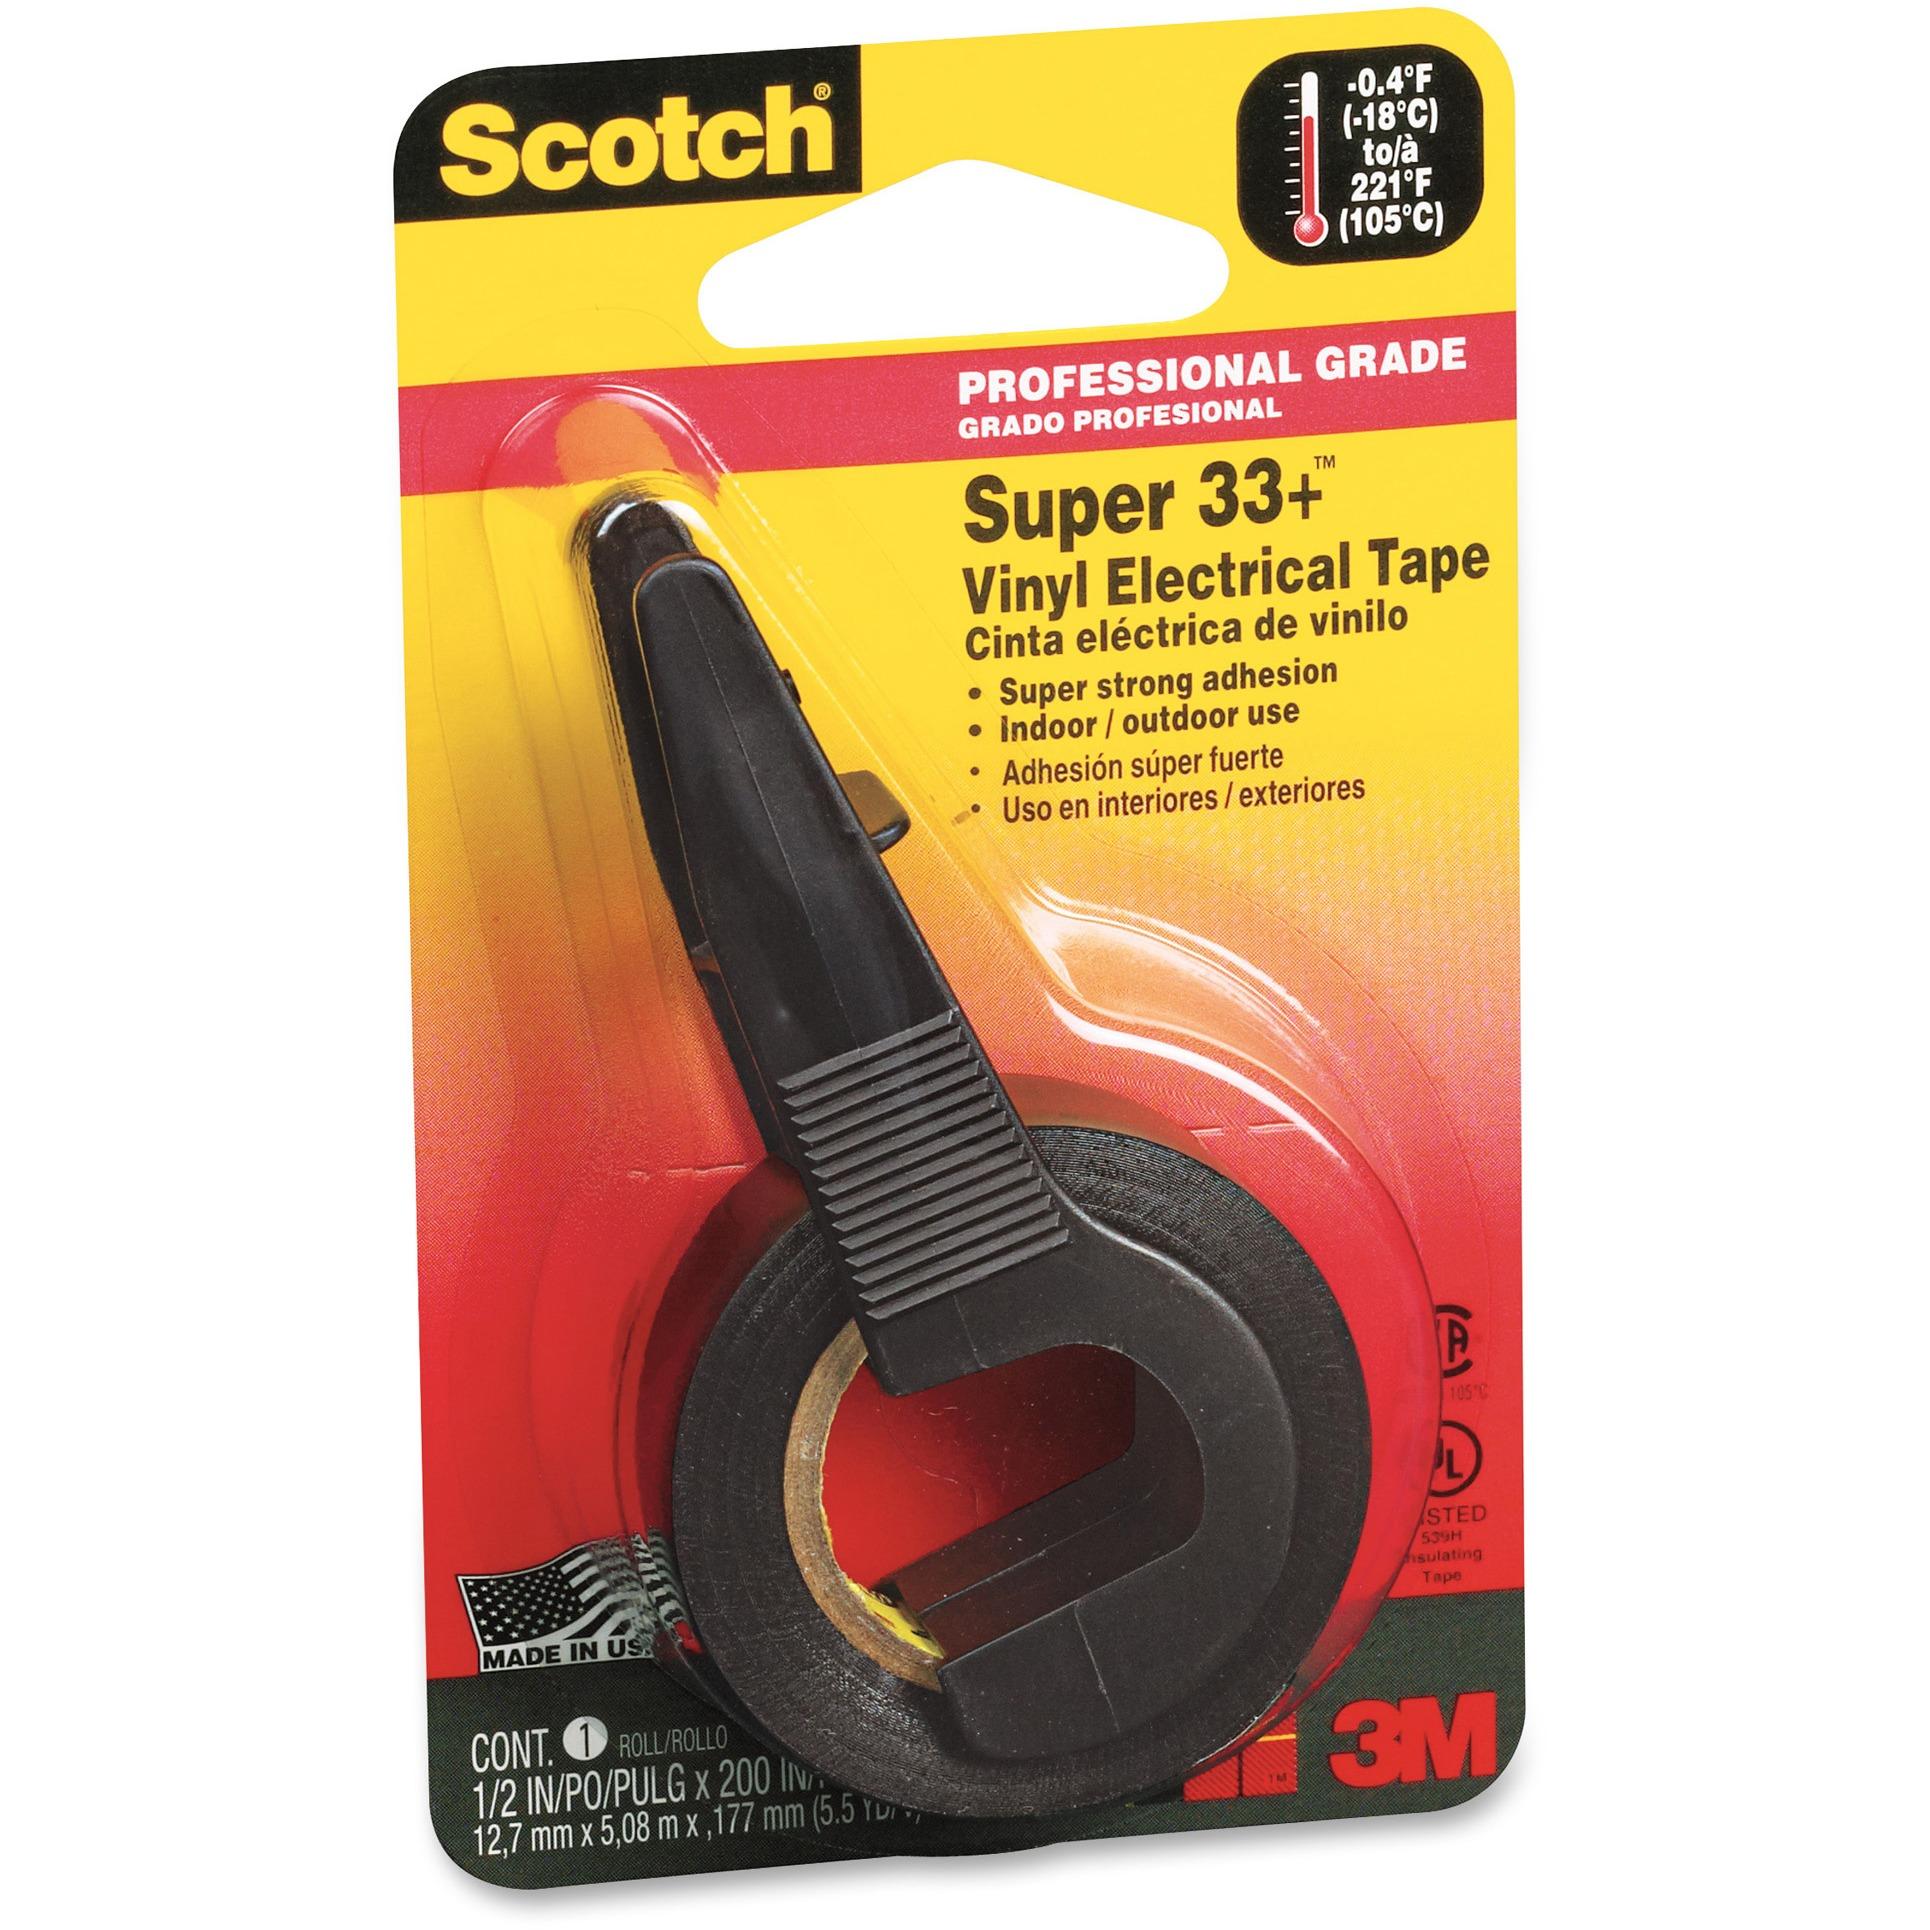 Scotch, MMM194, Electrical Tape, 1 Roll, Black